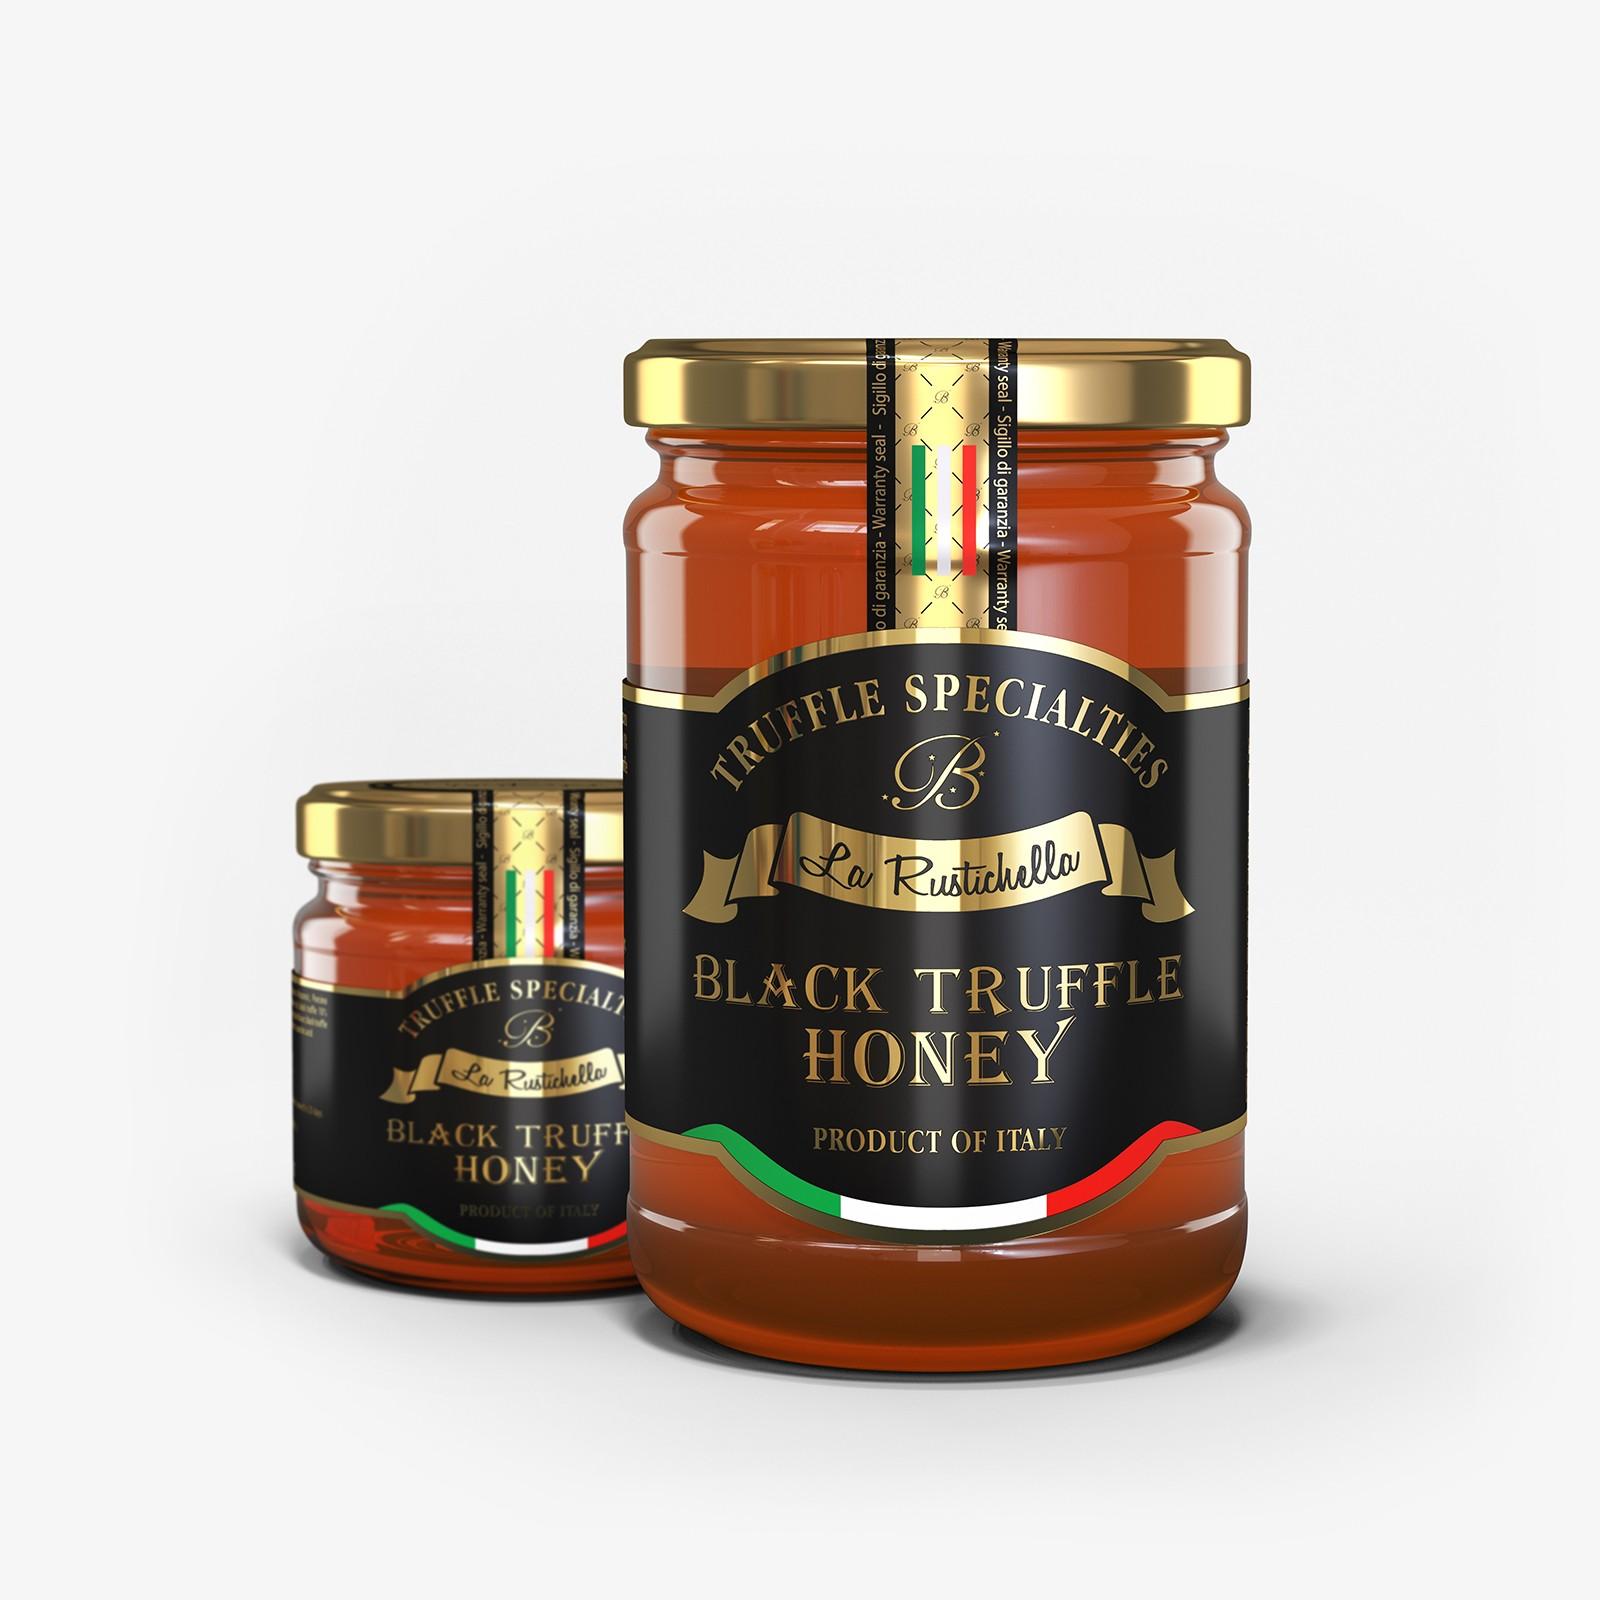 Black truffle honey